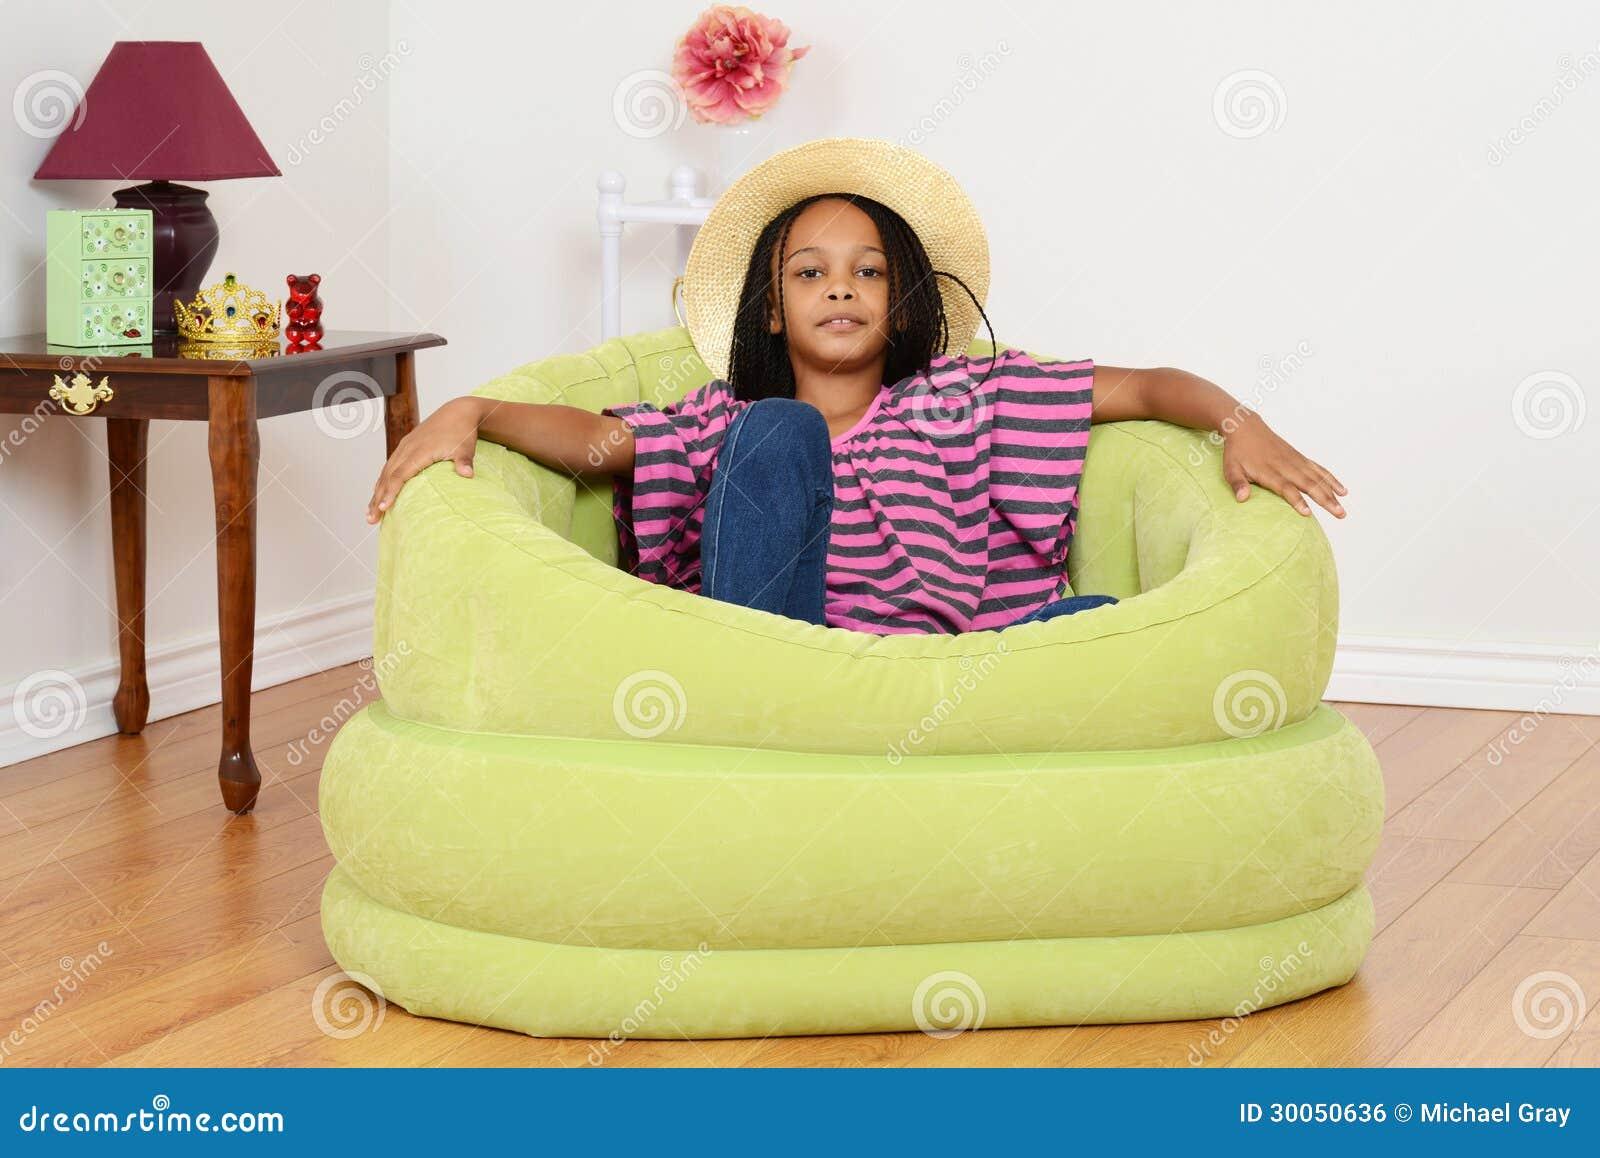 Black child sitting in chair -